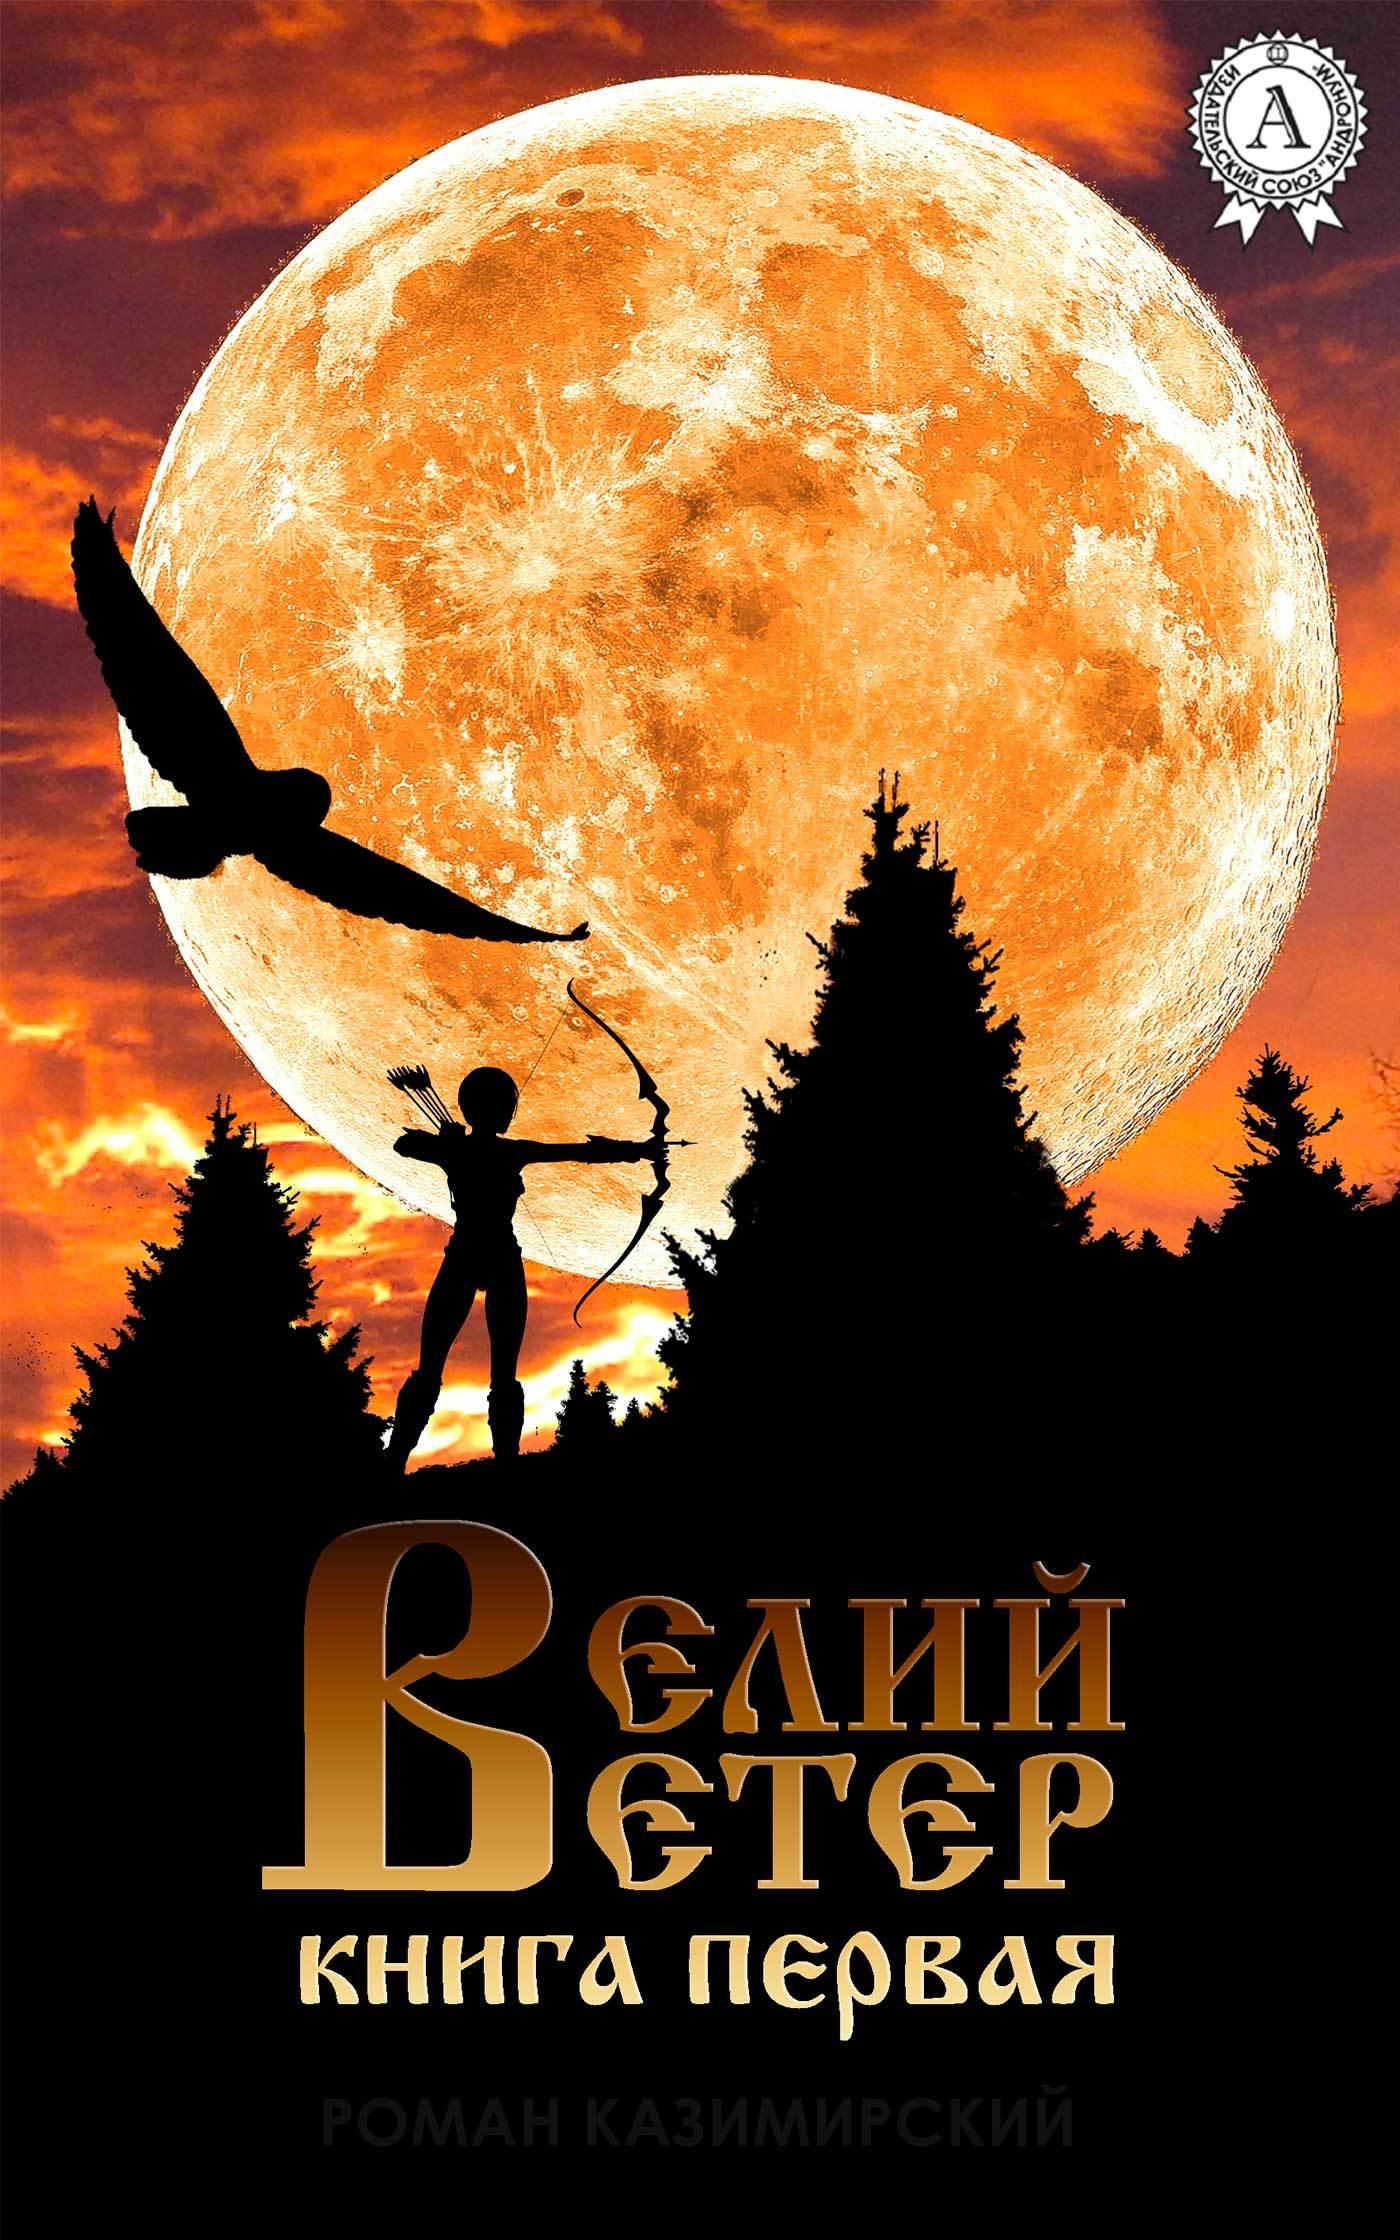 Фото - Роман Казимирский Велий ветер. Книга 1 казимирский роман велий ветер книга вторая